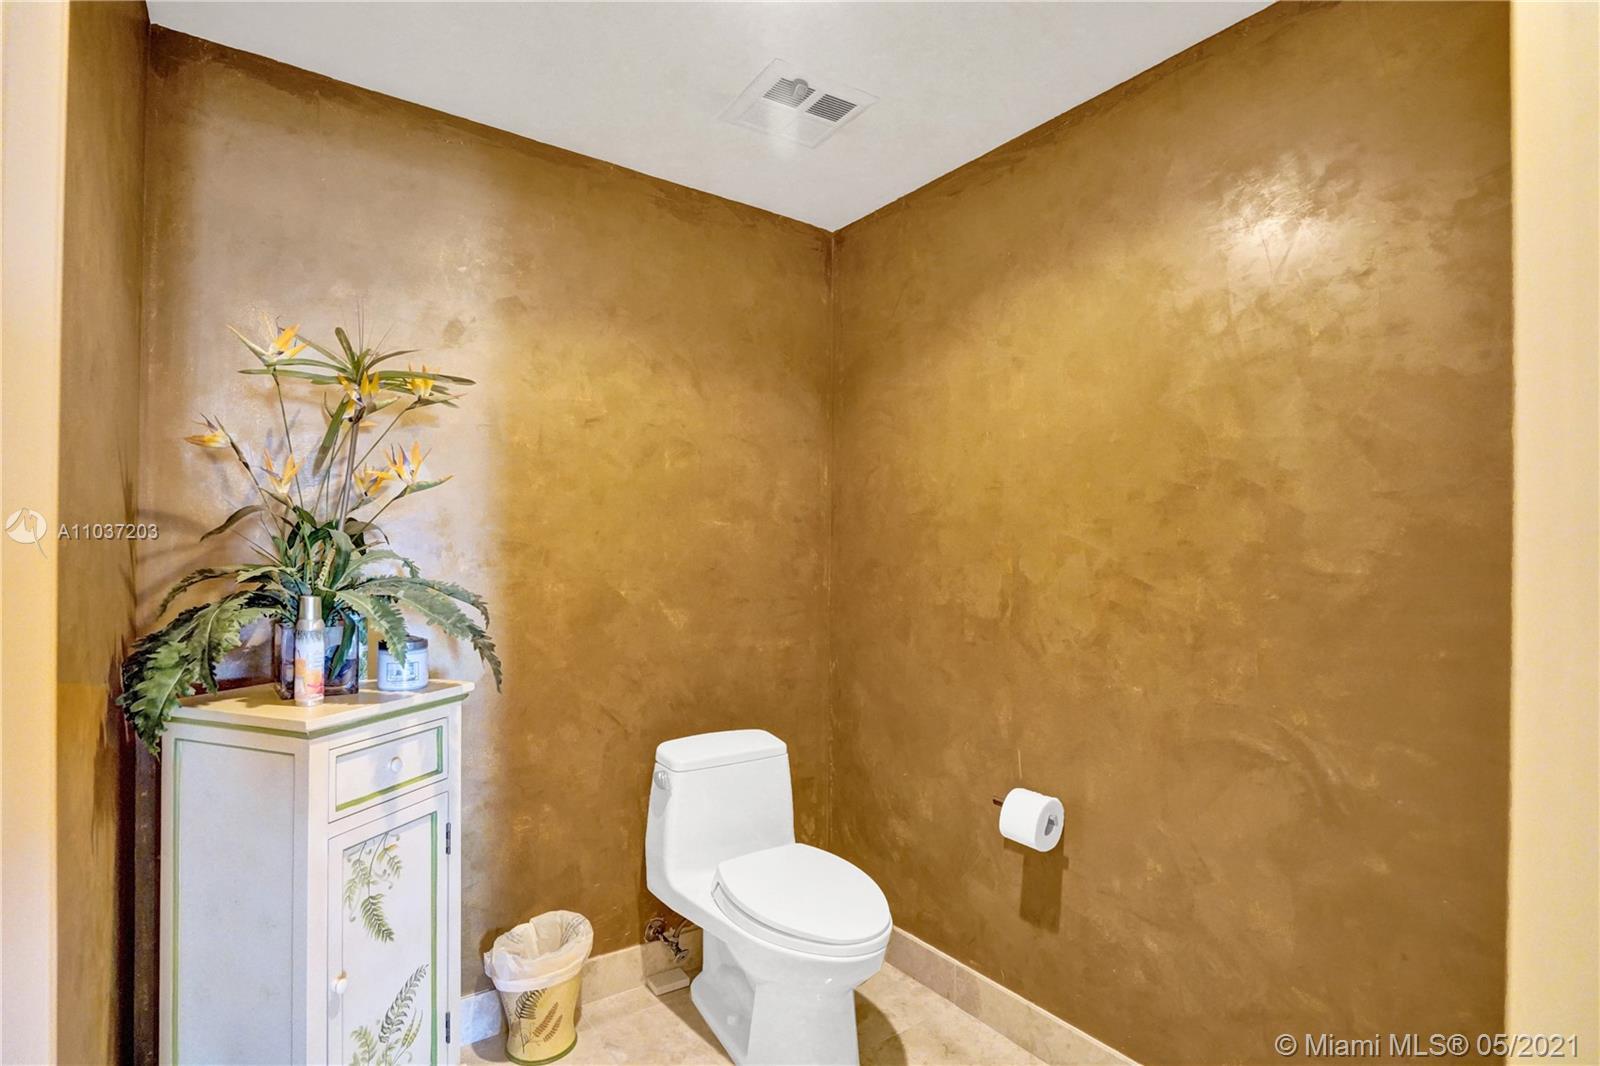 Photo of 20201 Country Club Dr #1006, Aventura, Florida, 33180 - Master bath.